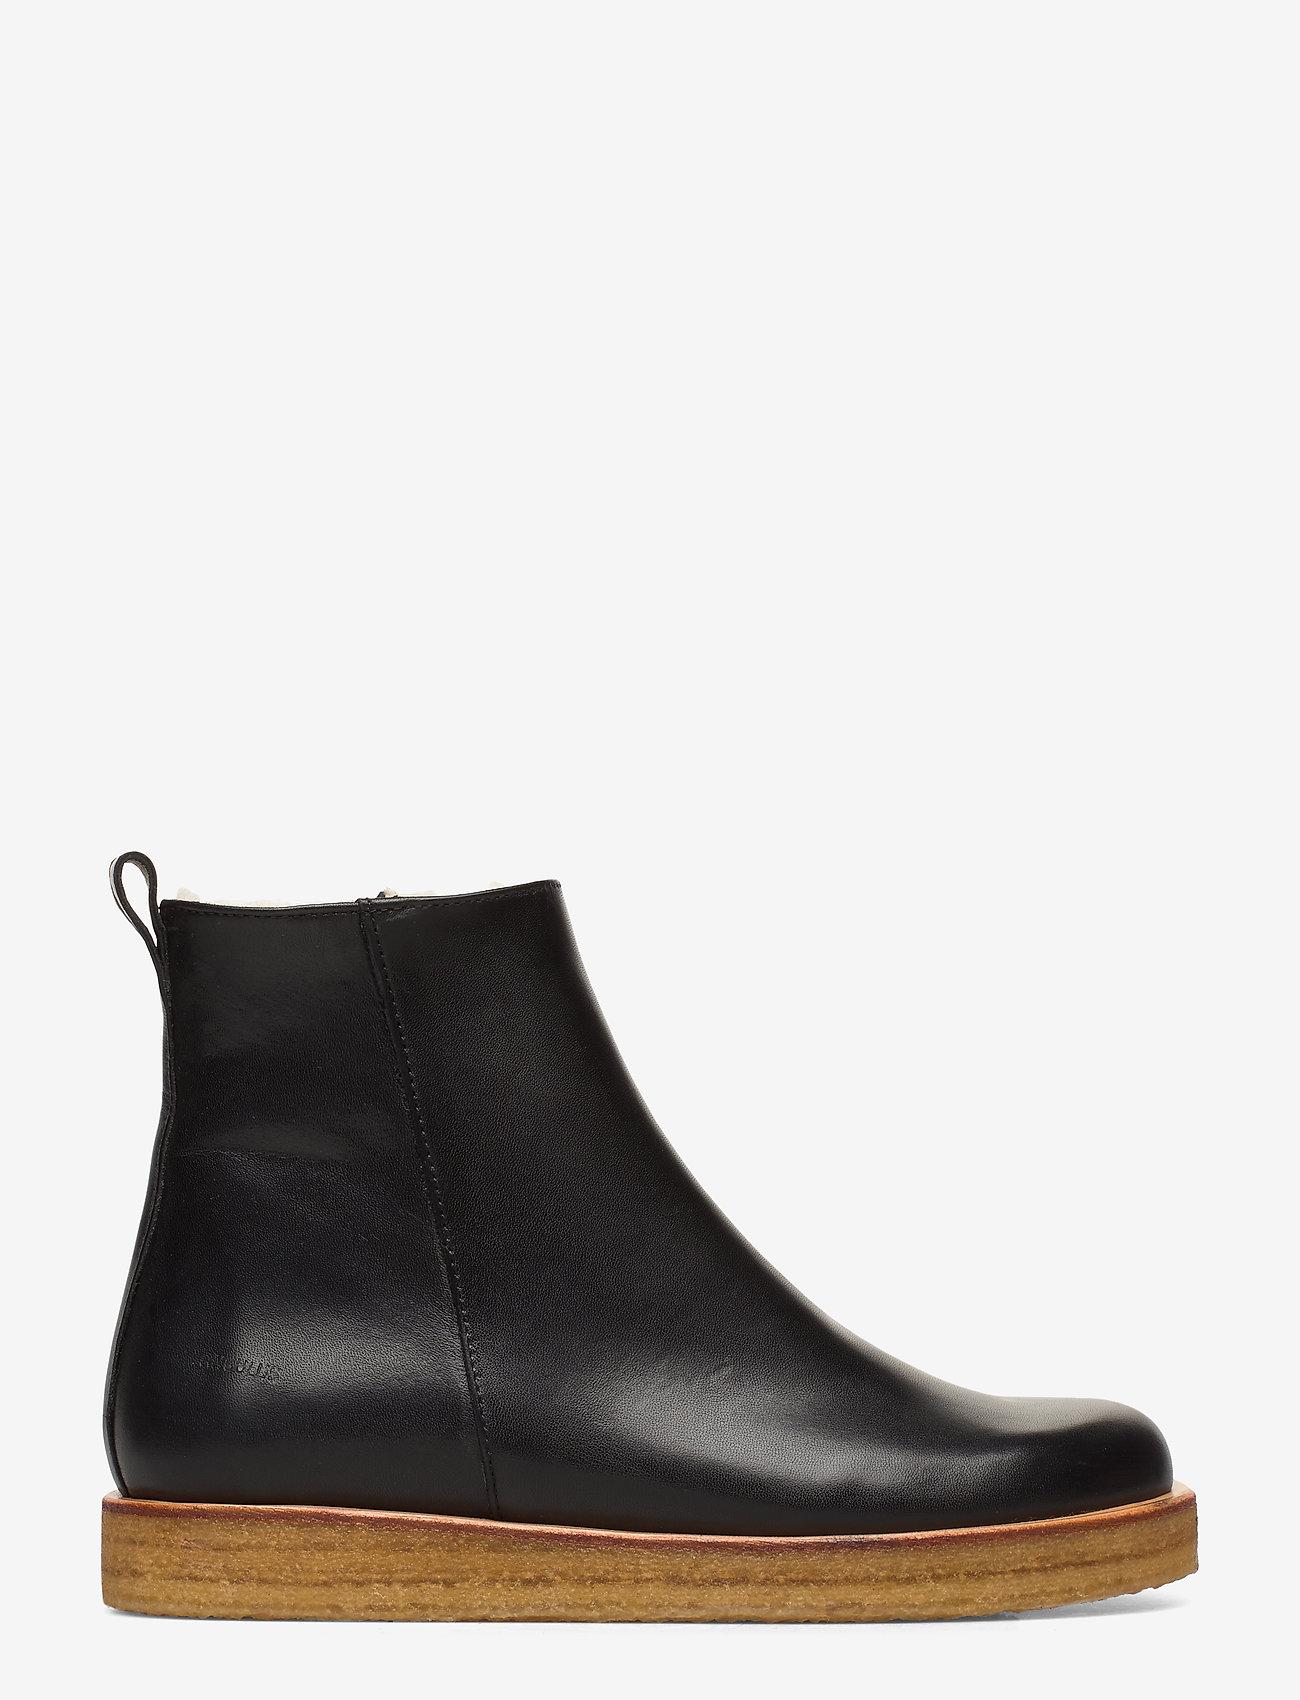 ANGULUS - Boots - flat - with zipper - flache stiefeletten - 1604 black - 1